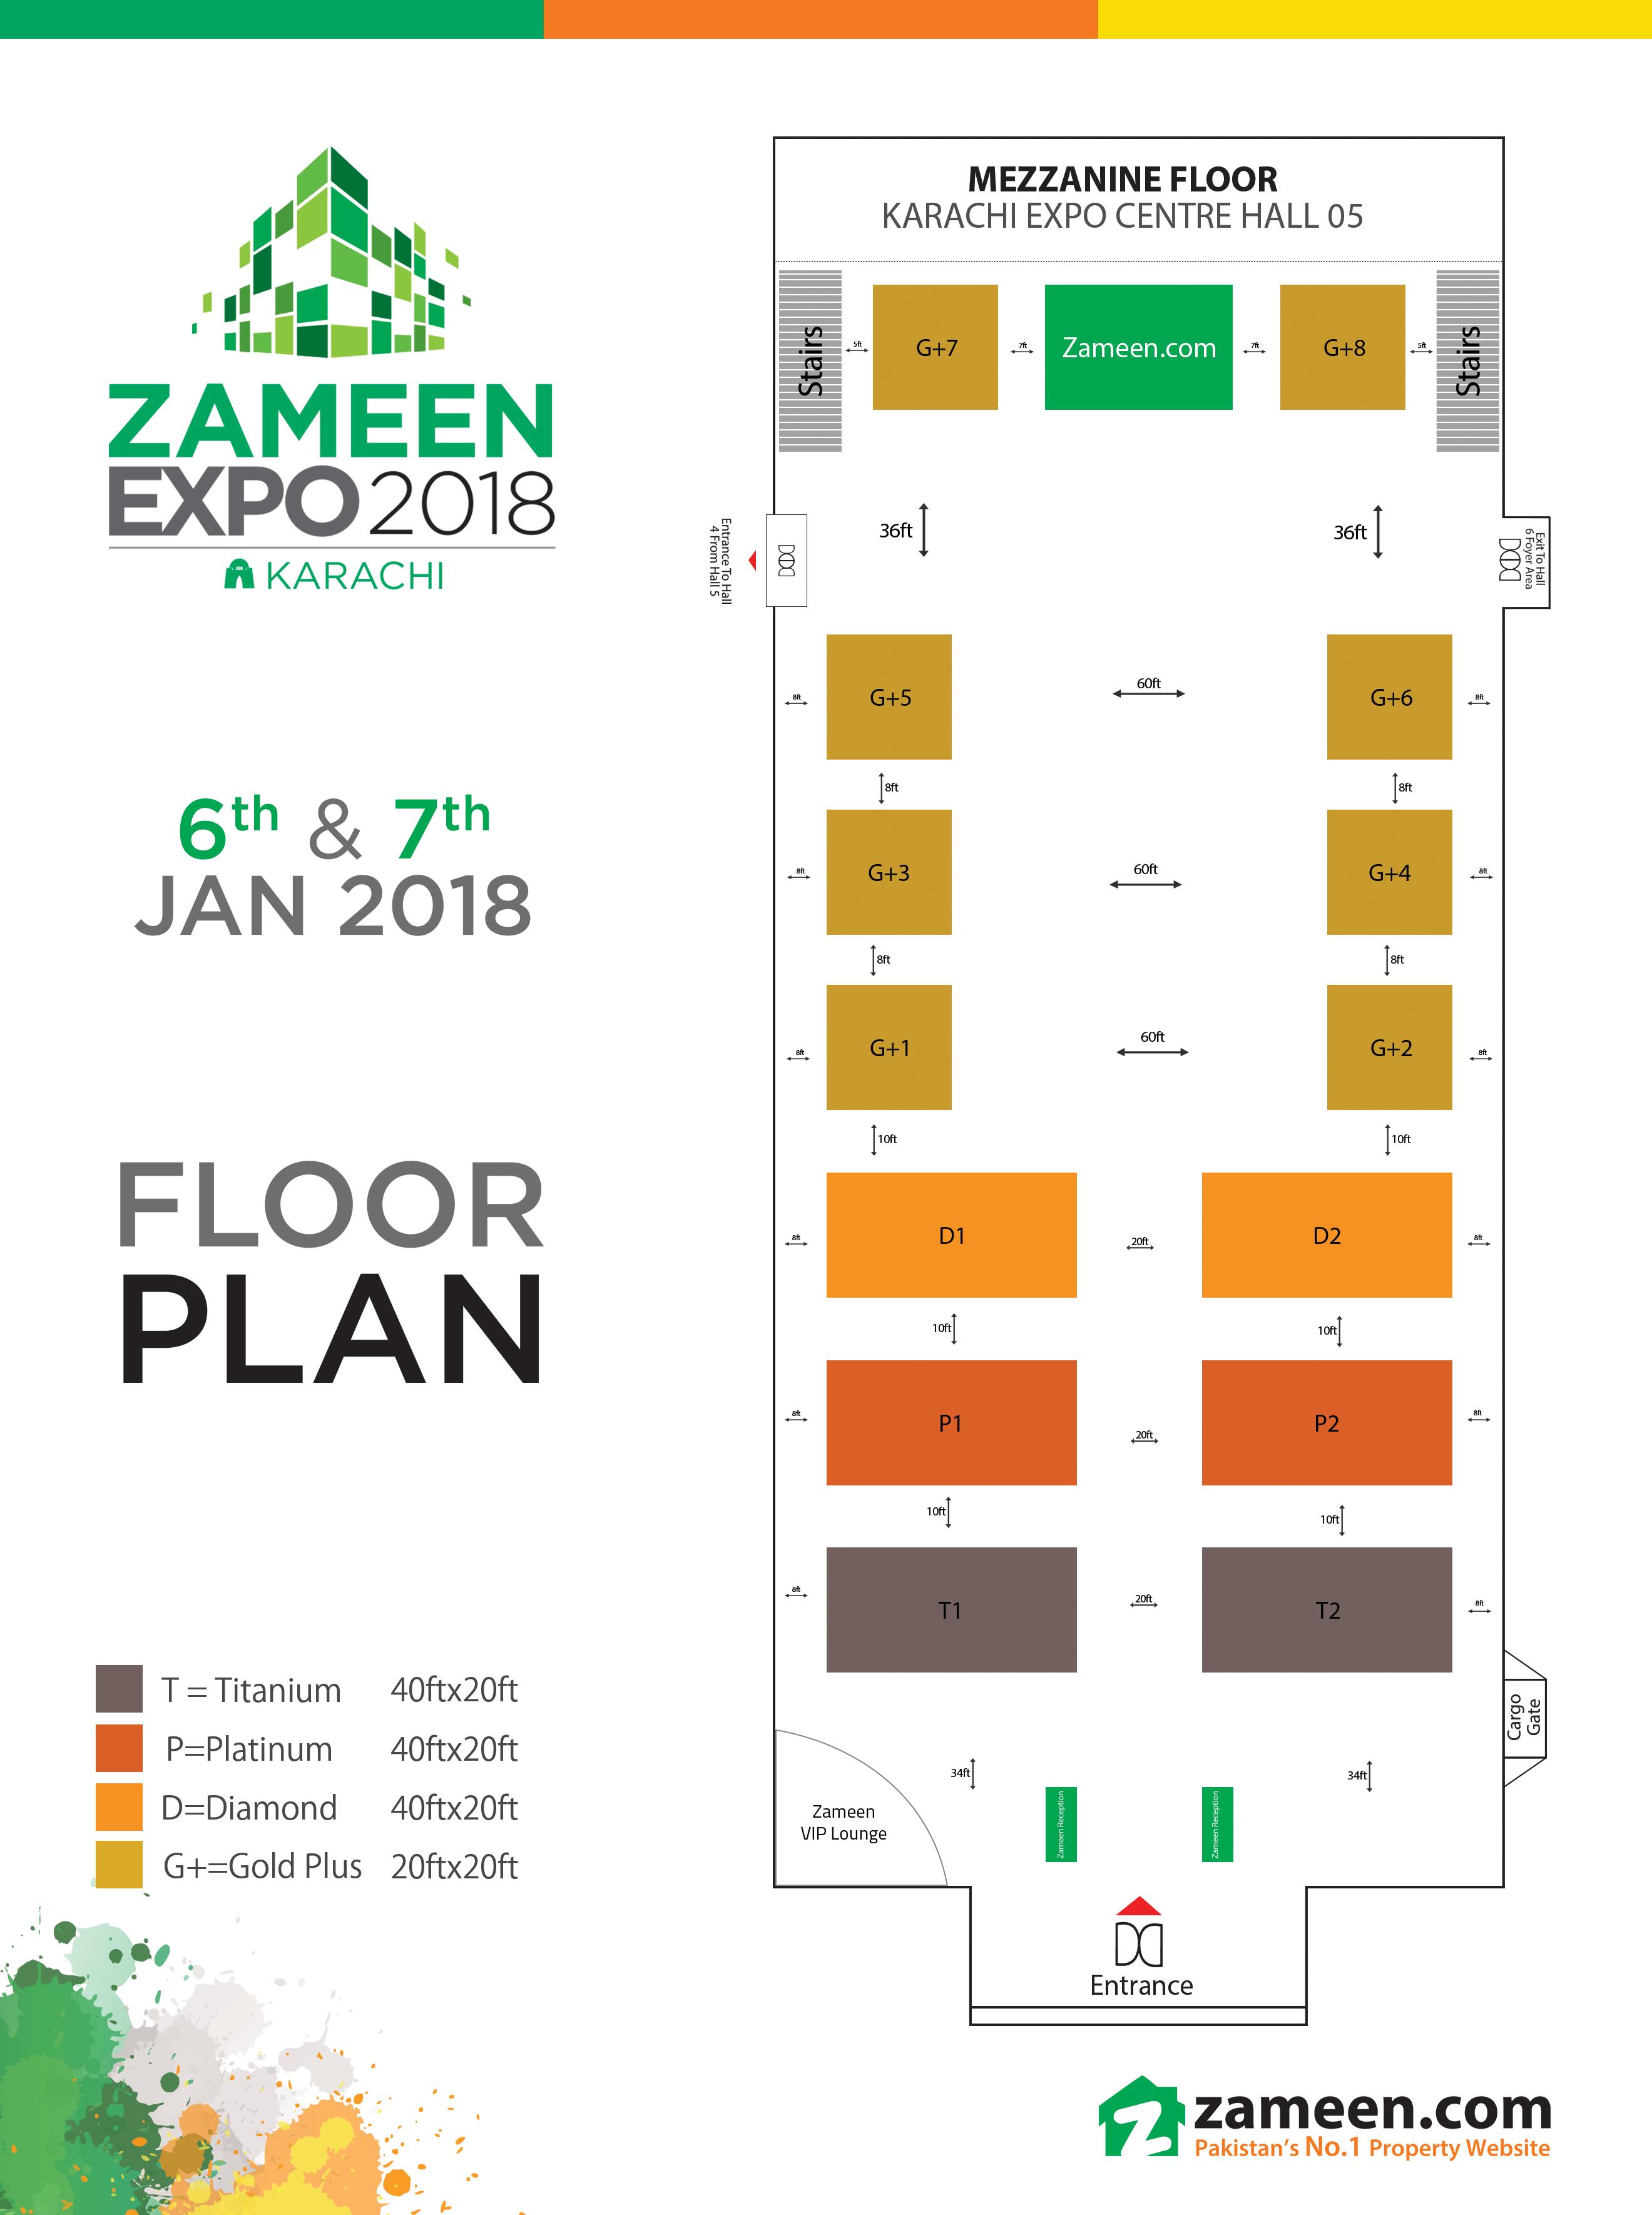 floorplan-karachi-2018-img2